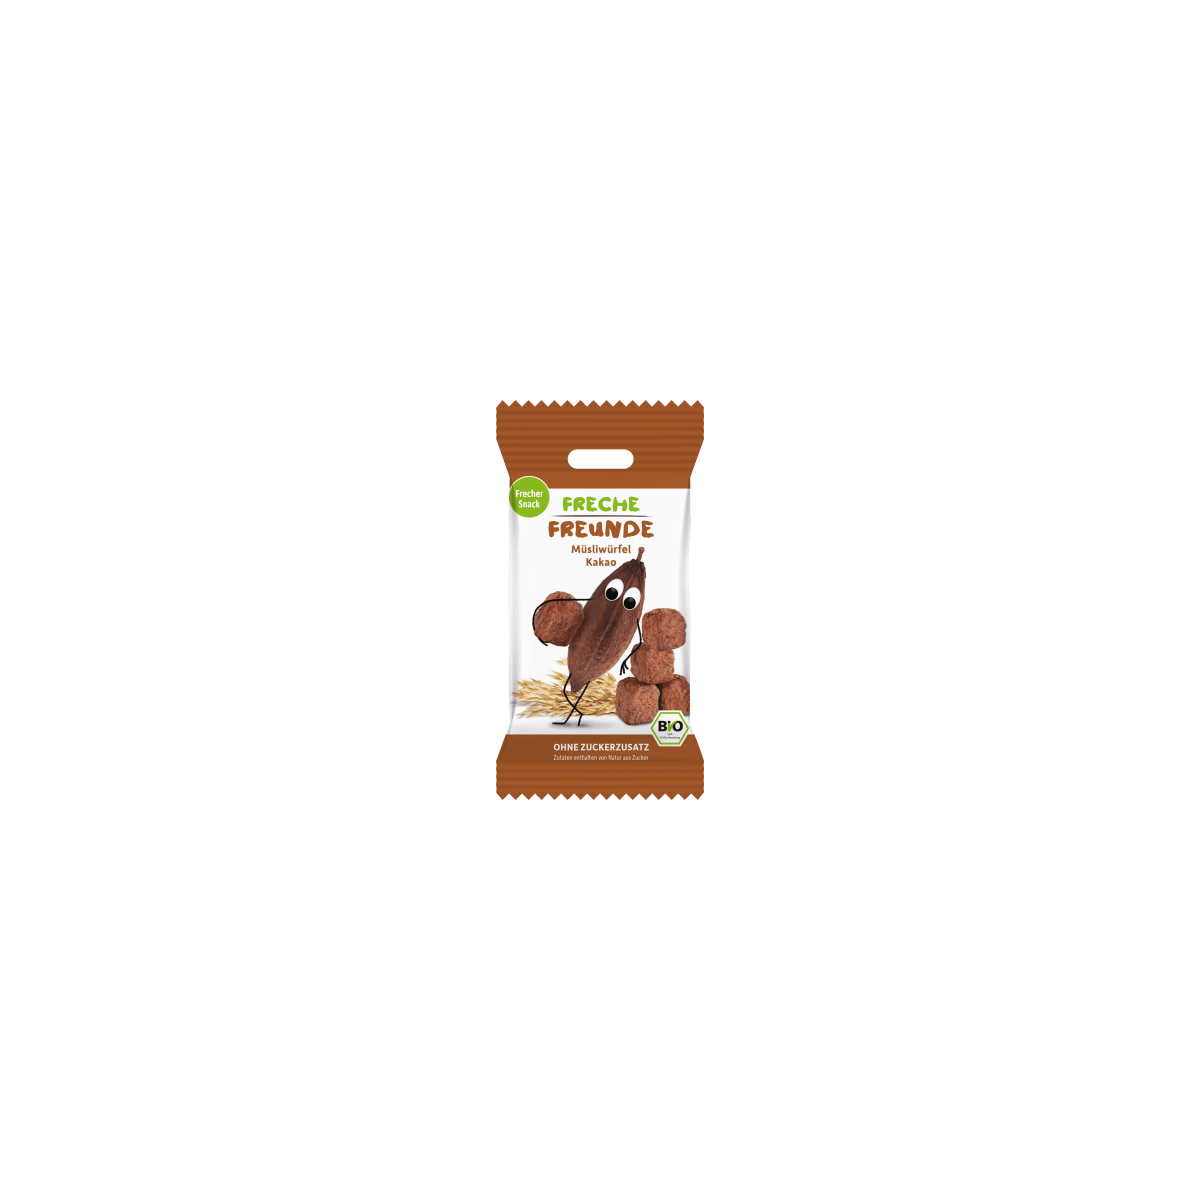 Freche Freunde Müsliwürfel Kakao 20g (6er Pack)